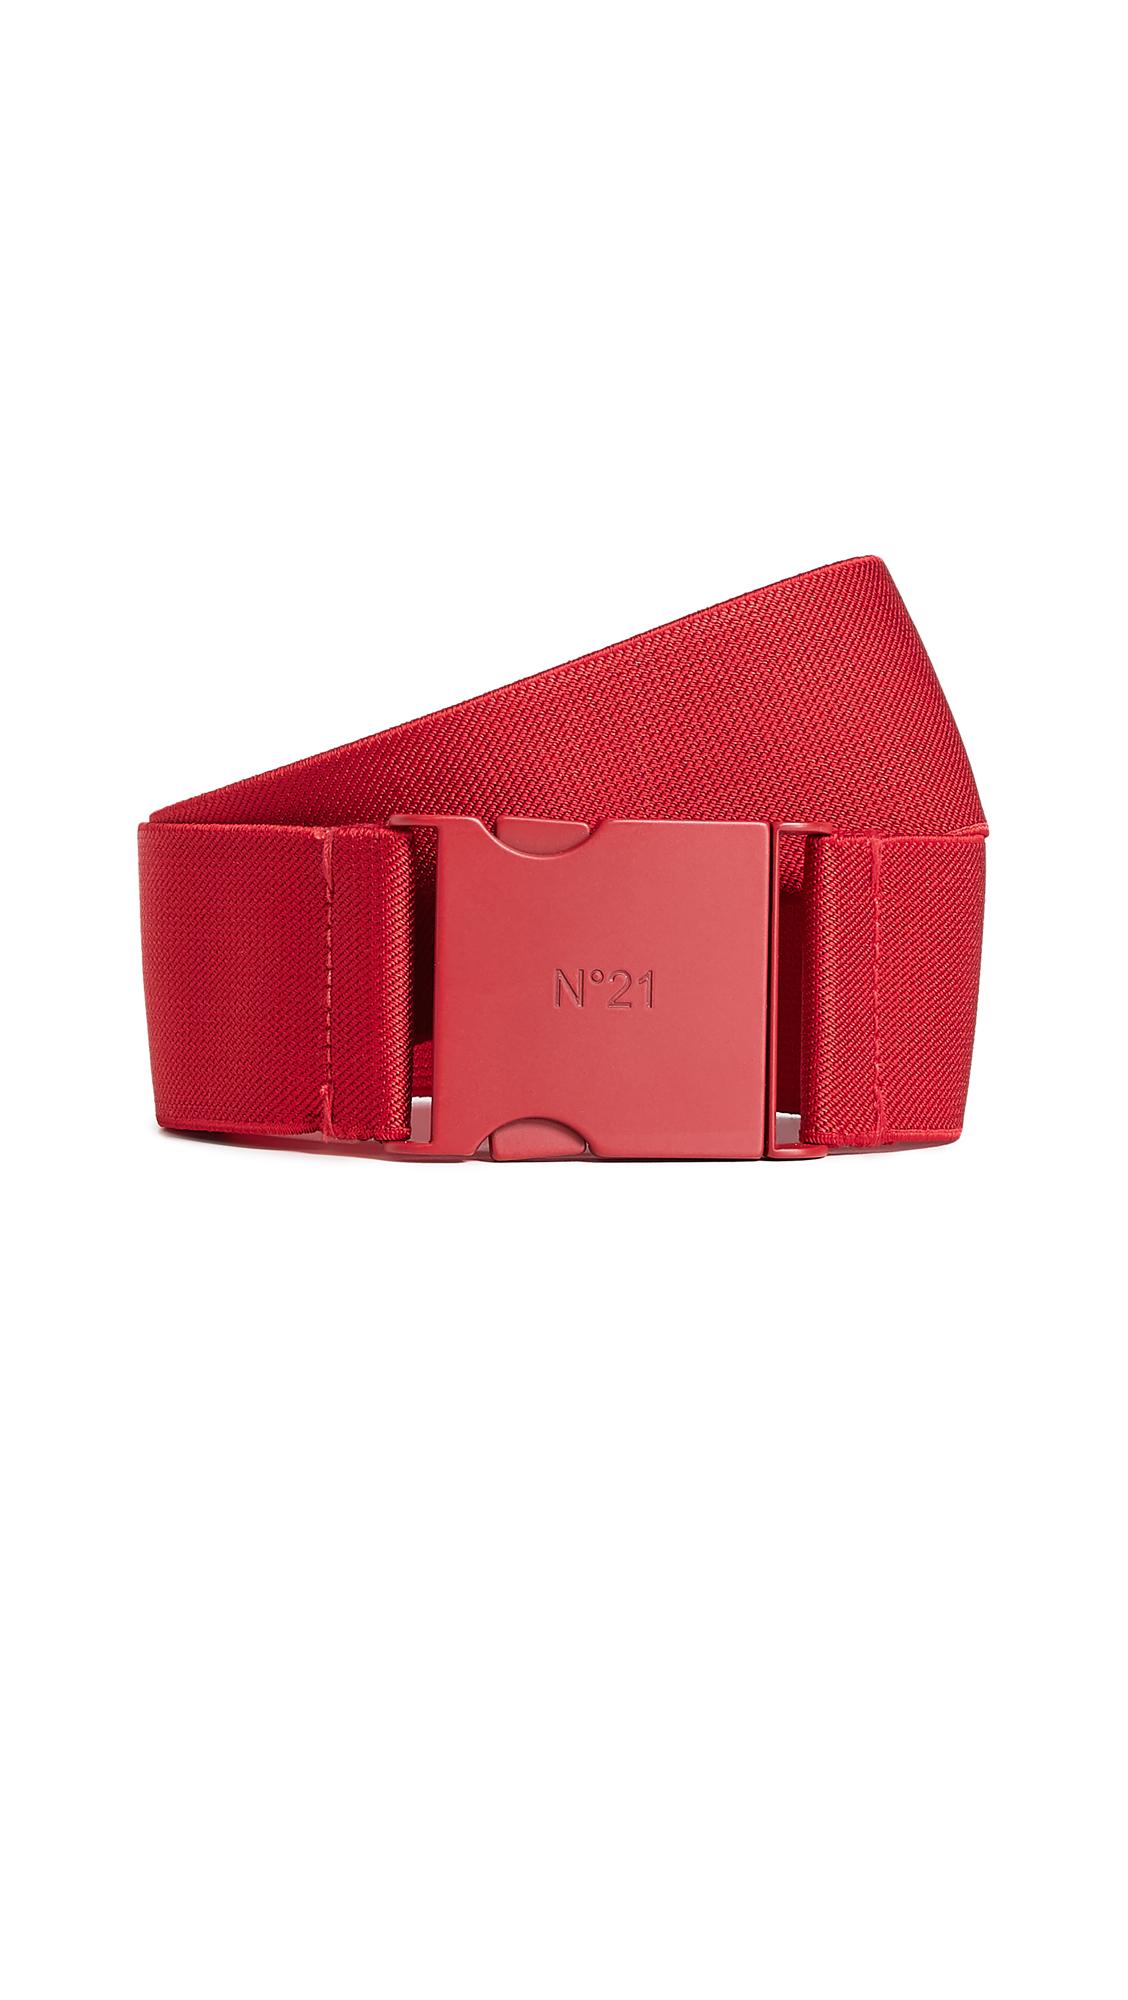 Elastic Buckle Belt in Red